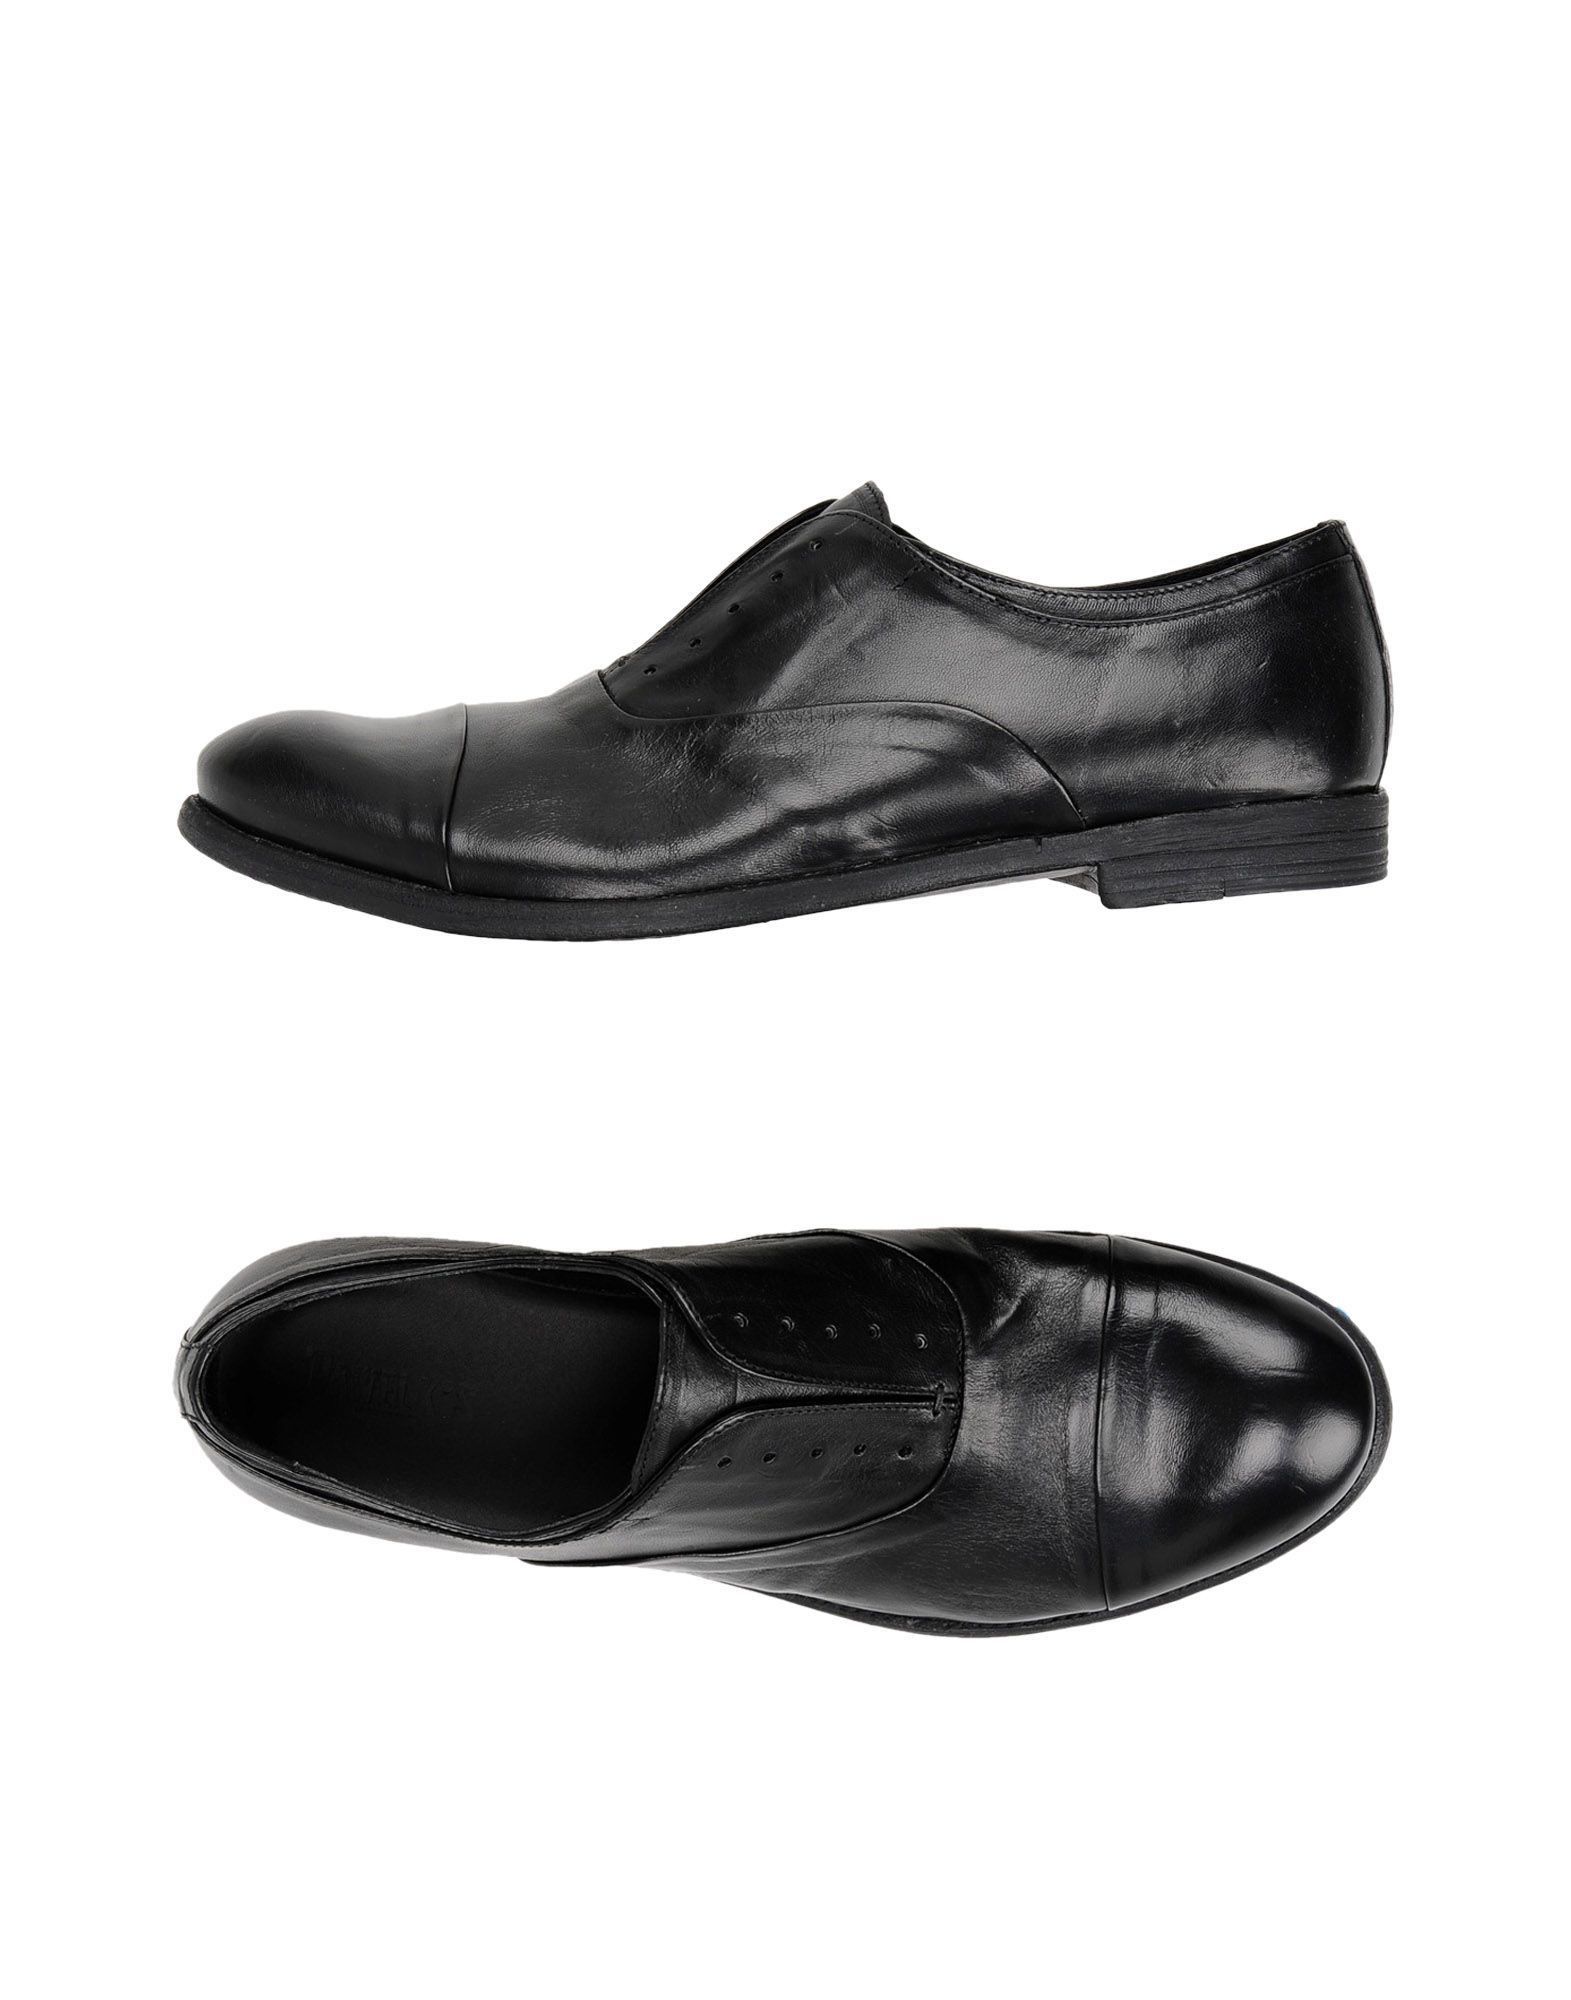 PAWELK'S Loafers in Black